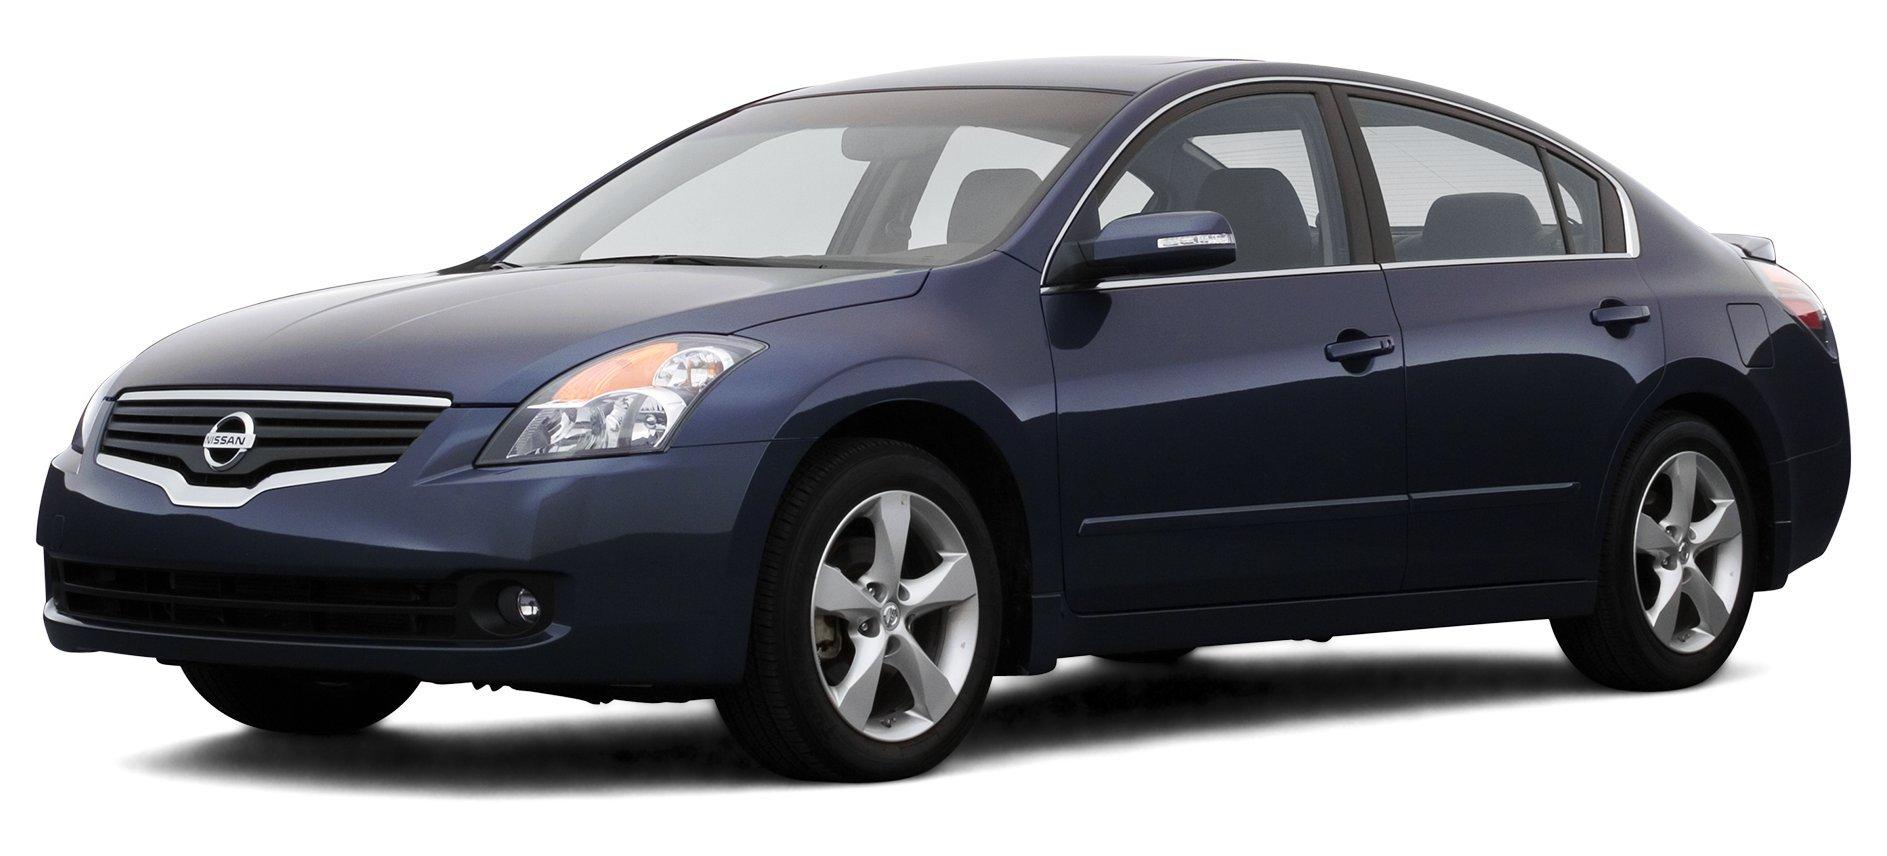 2007 Mazda 3 Mazdaspeed3 GT, 5-Door Hatchback Manual Transmission, 2007 Nissan Altima 3.5SE, 4-Door Sedan V6 Manual Transmission ...